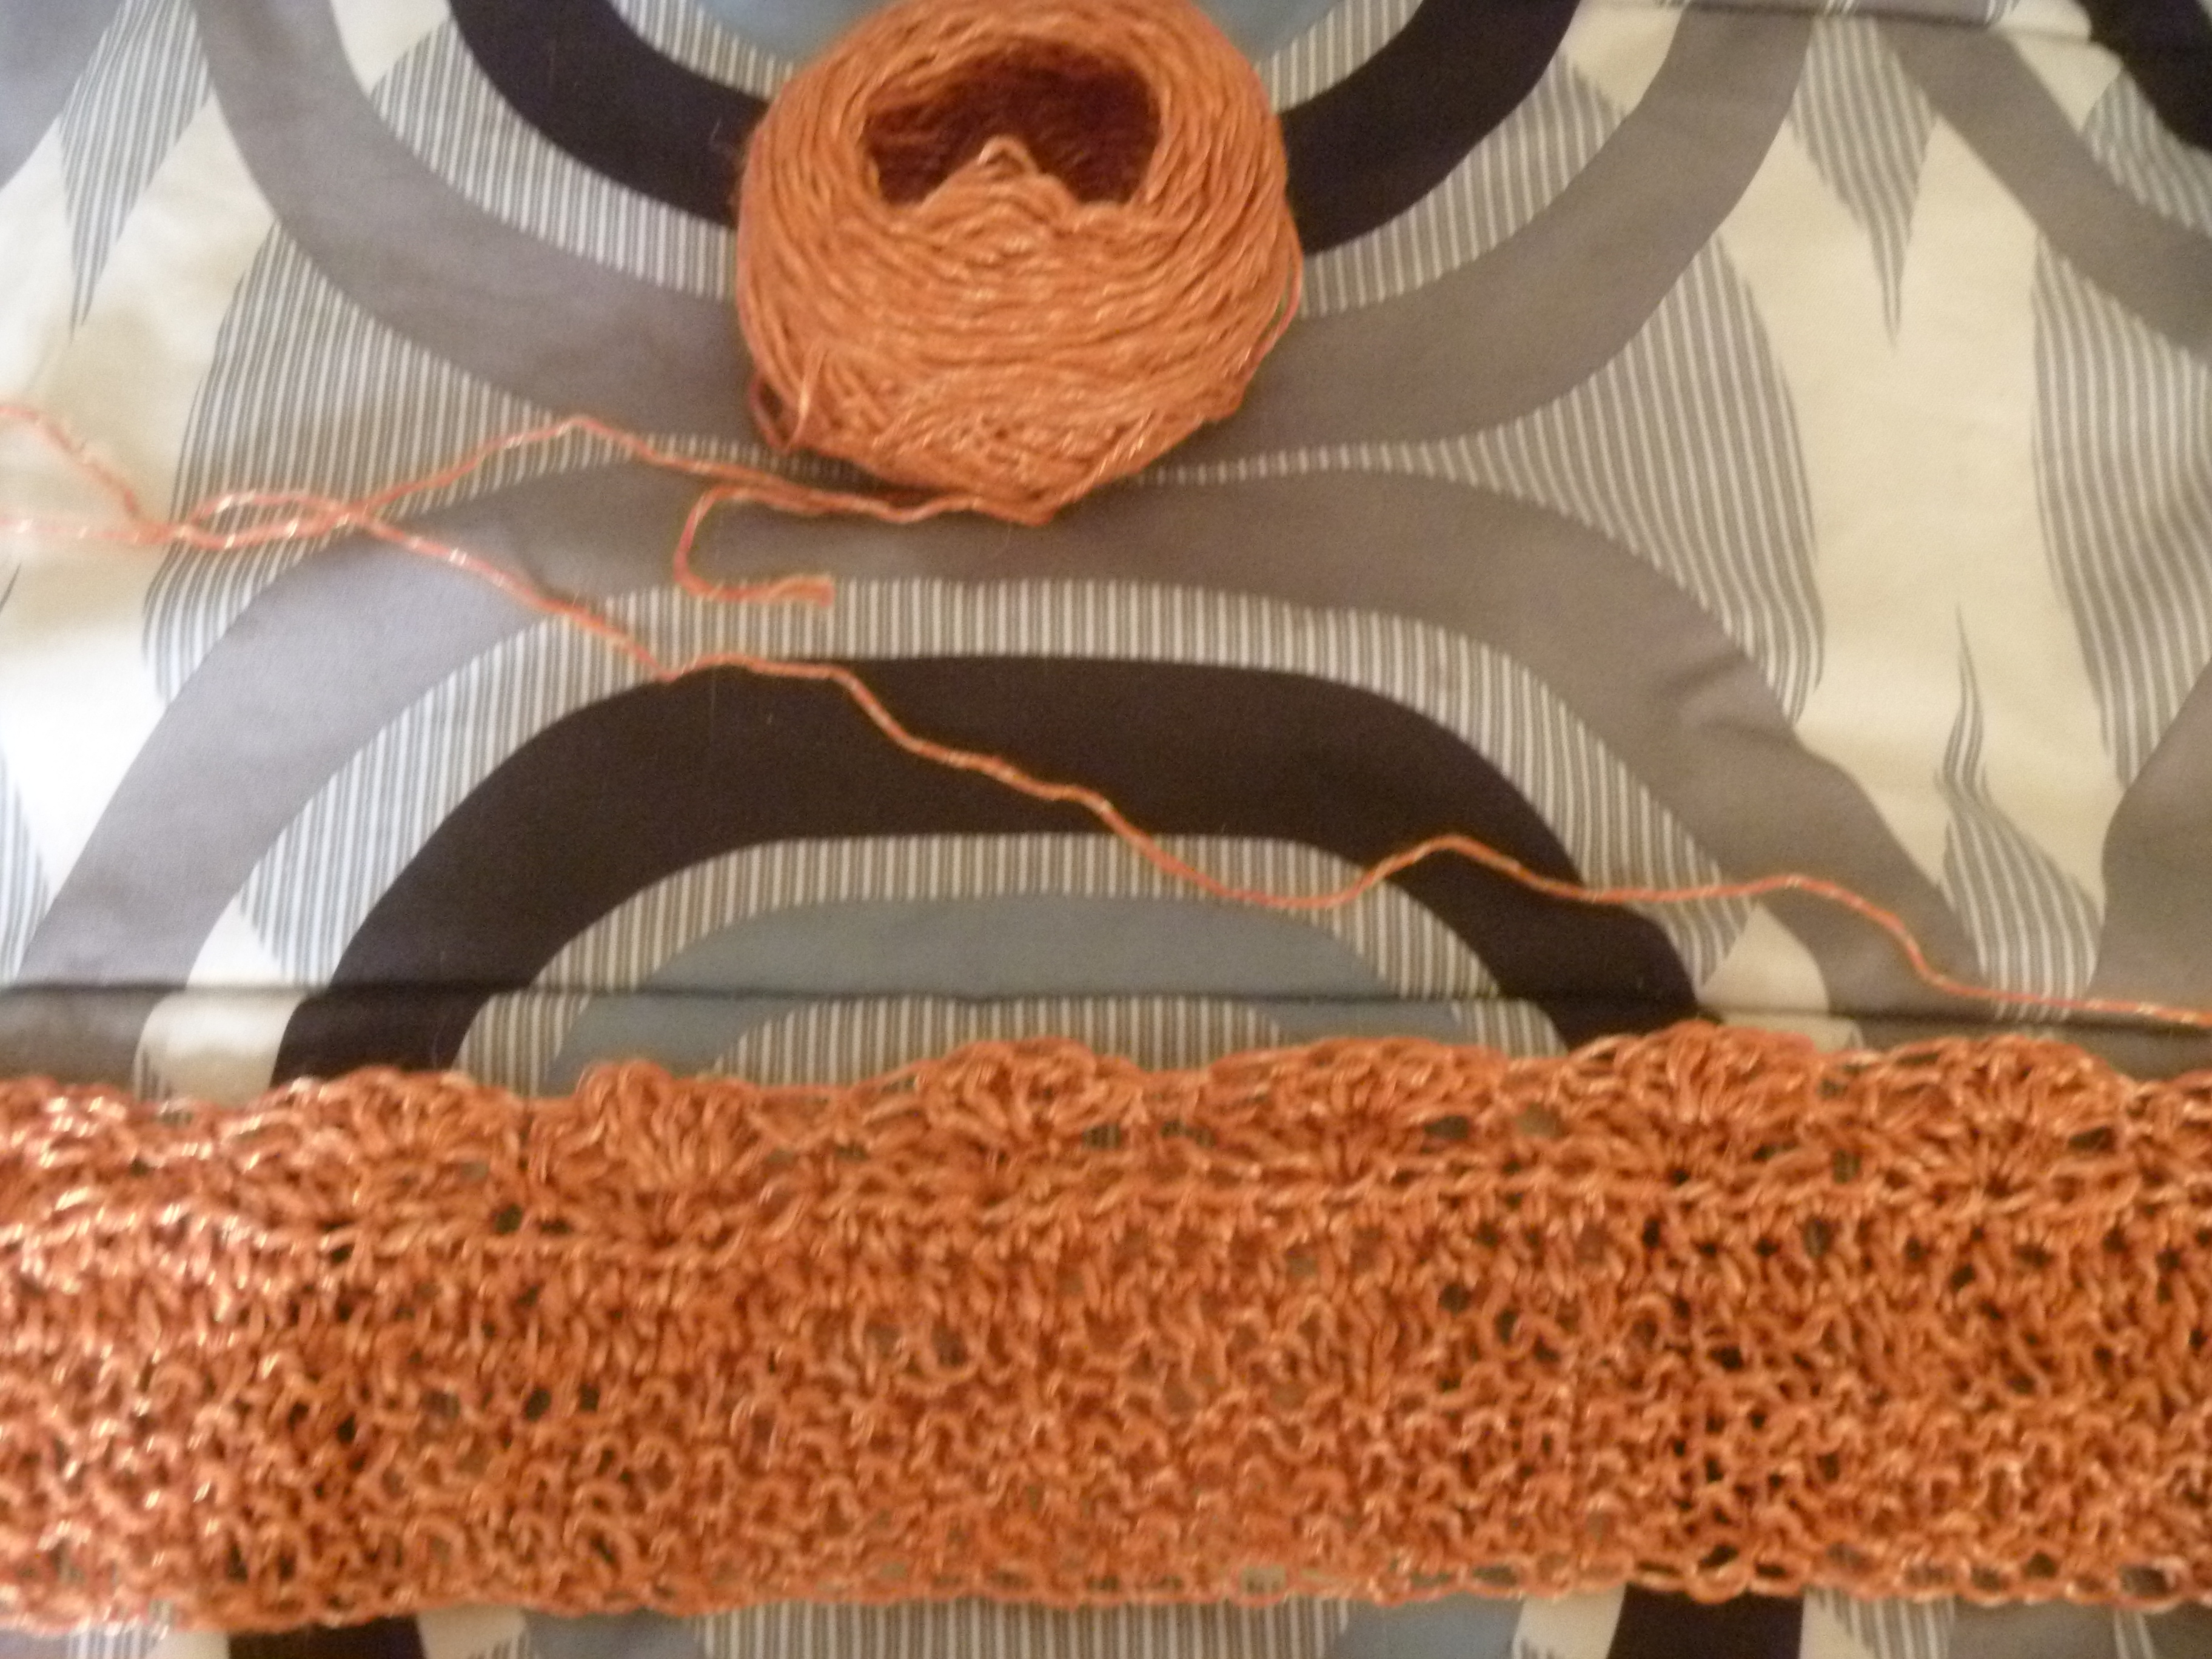 orange knit to crochet scarf or something